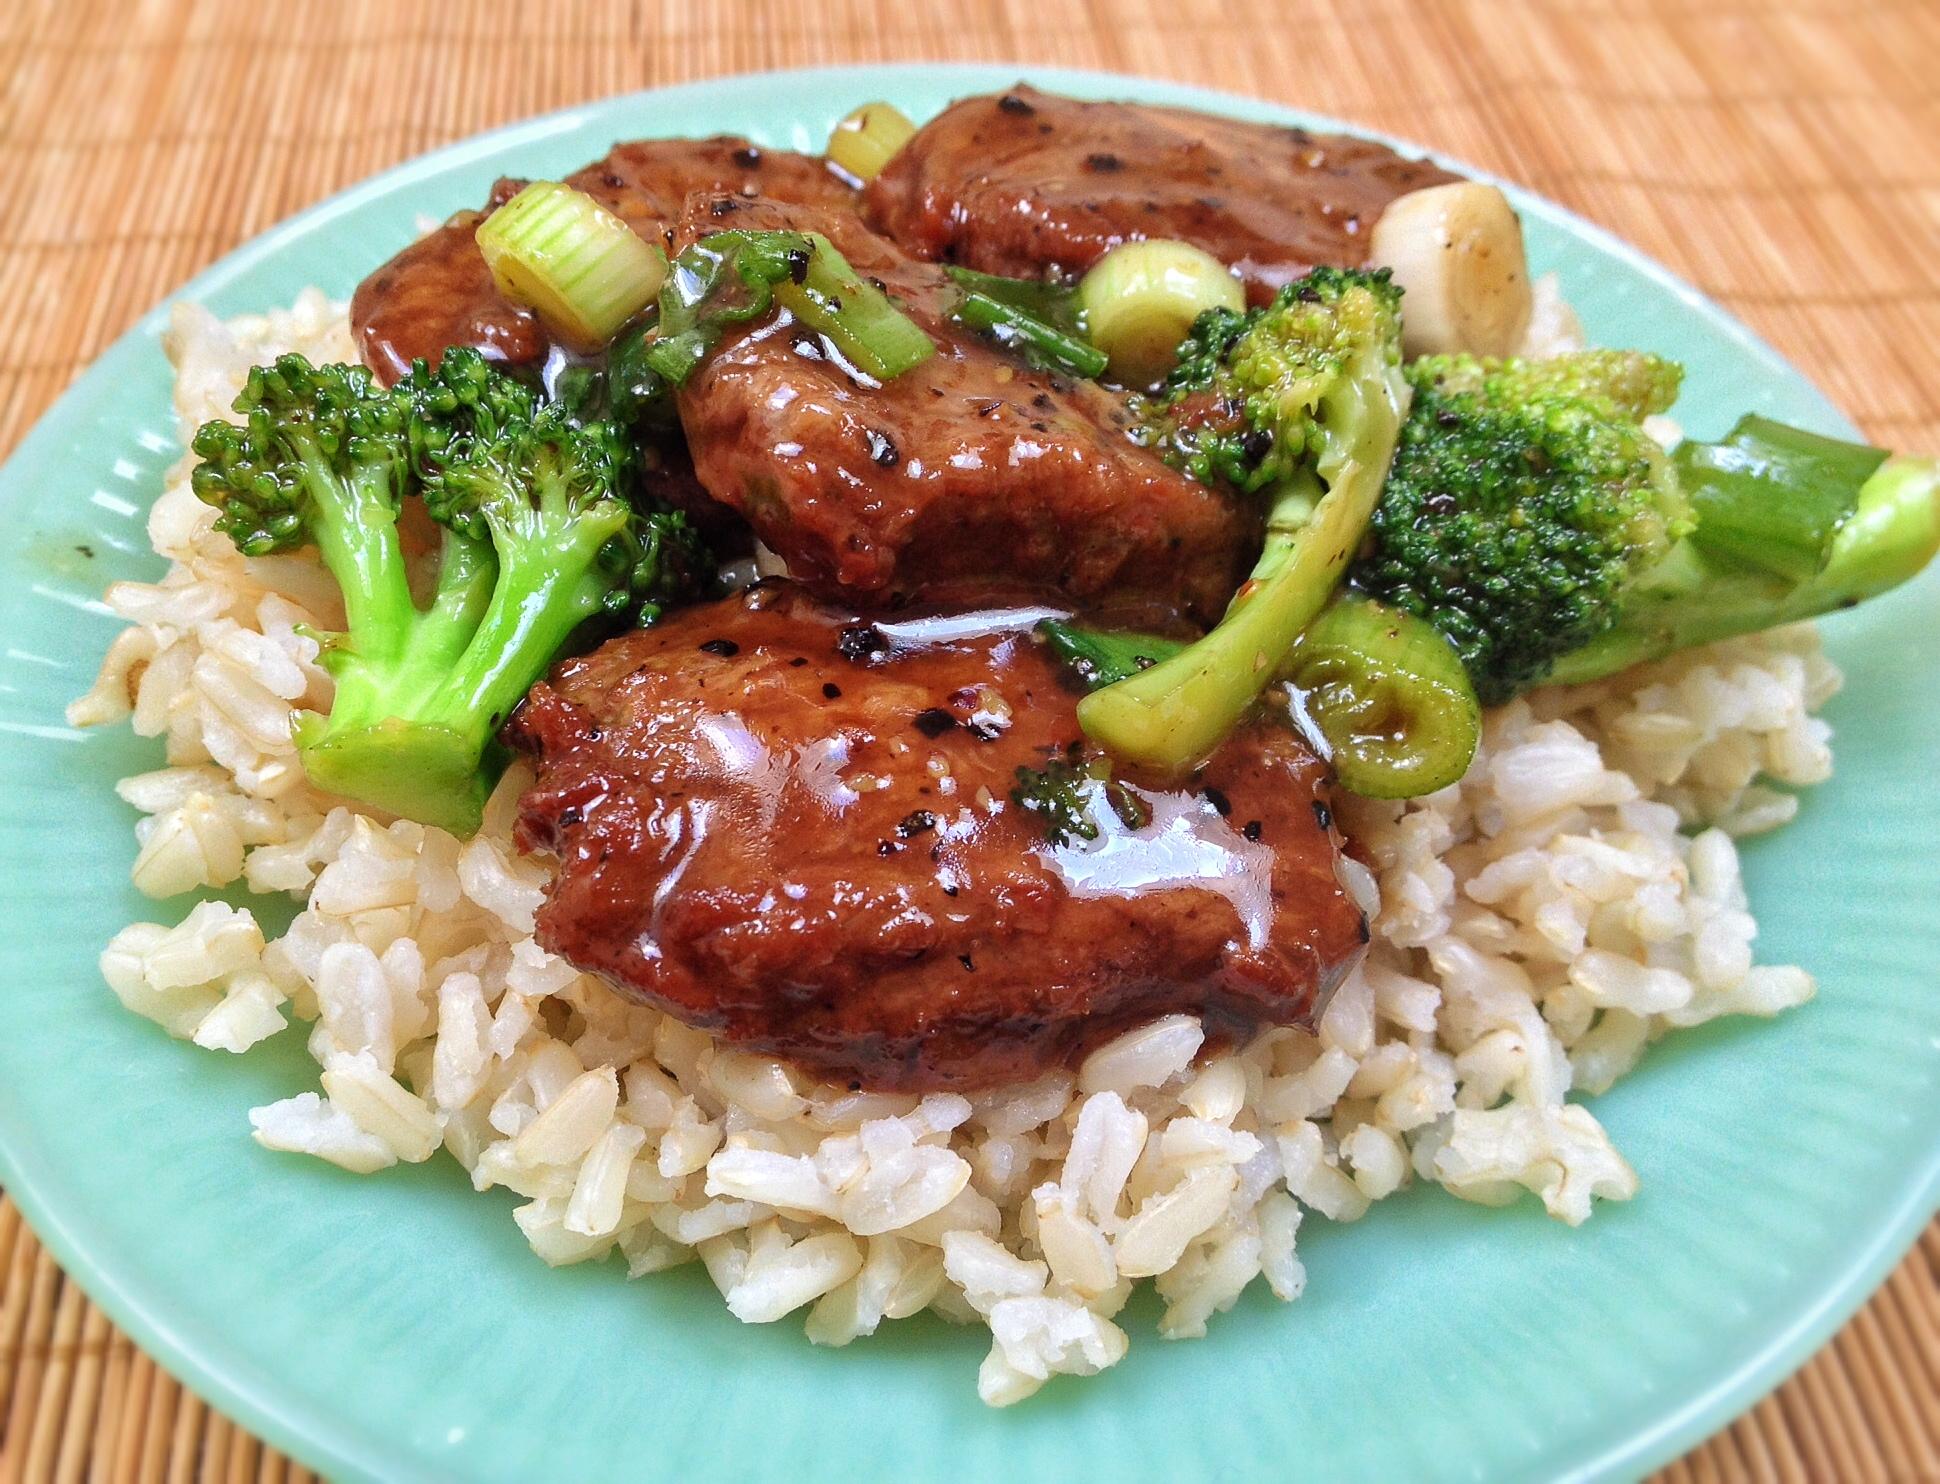 Black Pepper Steak by Vegetarian Plus (VegeUSA®)